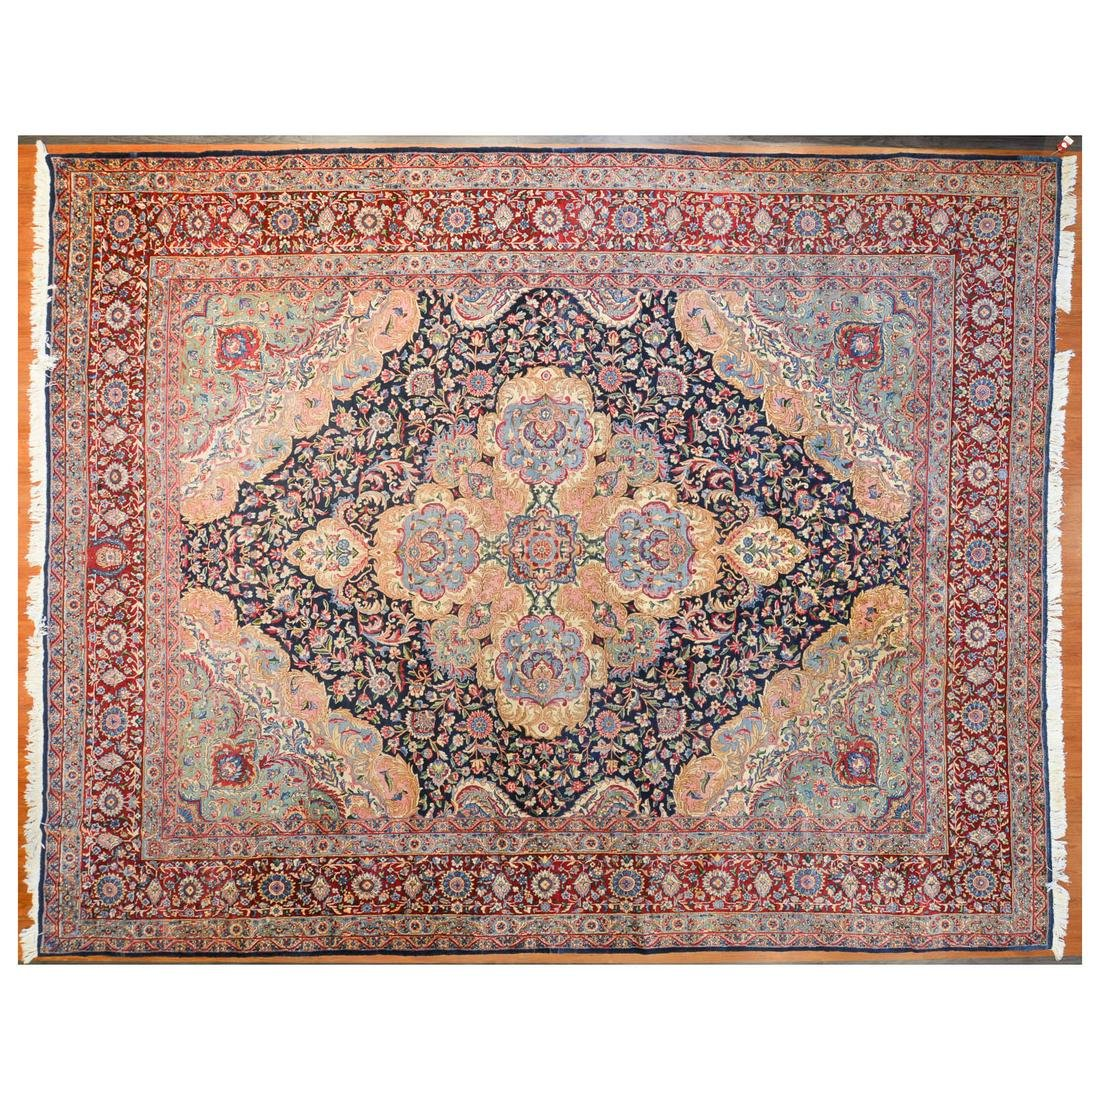 Fine Kerman Carpet, Persia, 11.10 x 14.10